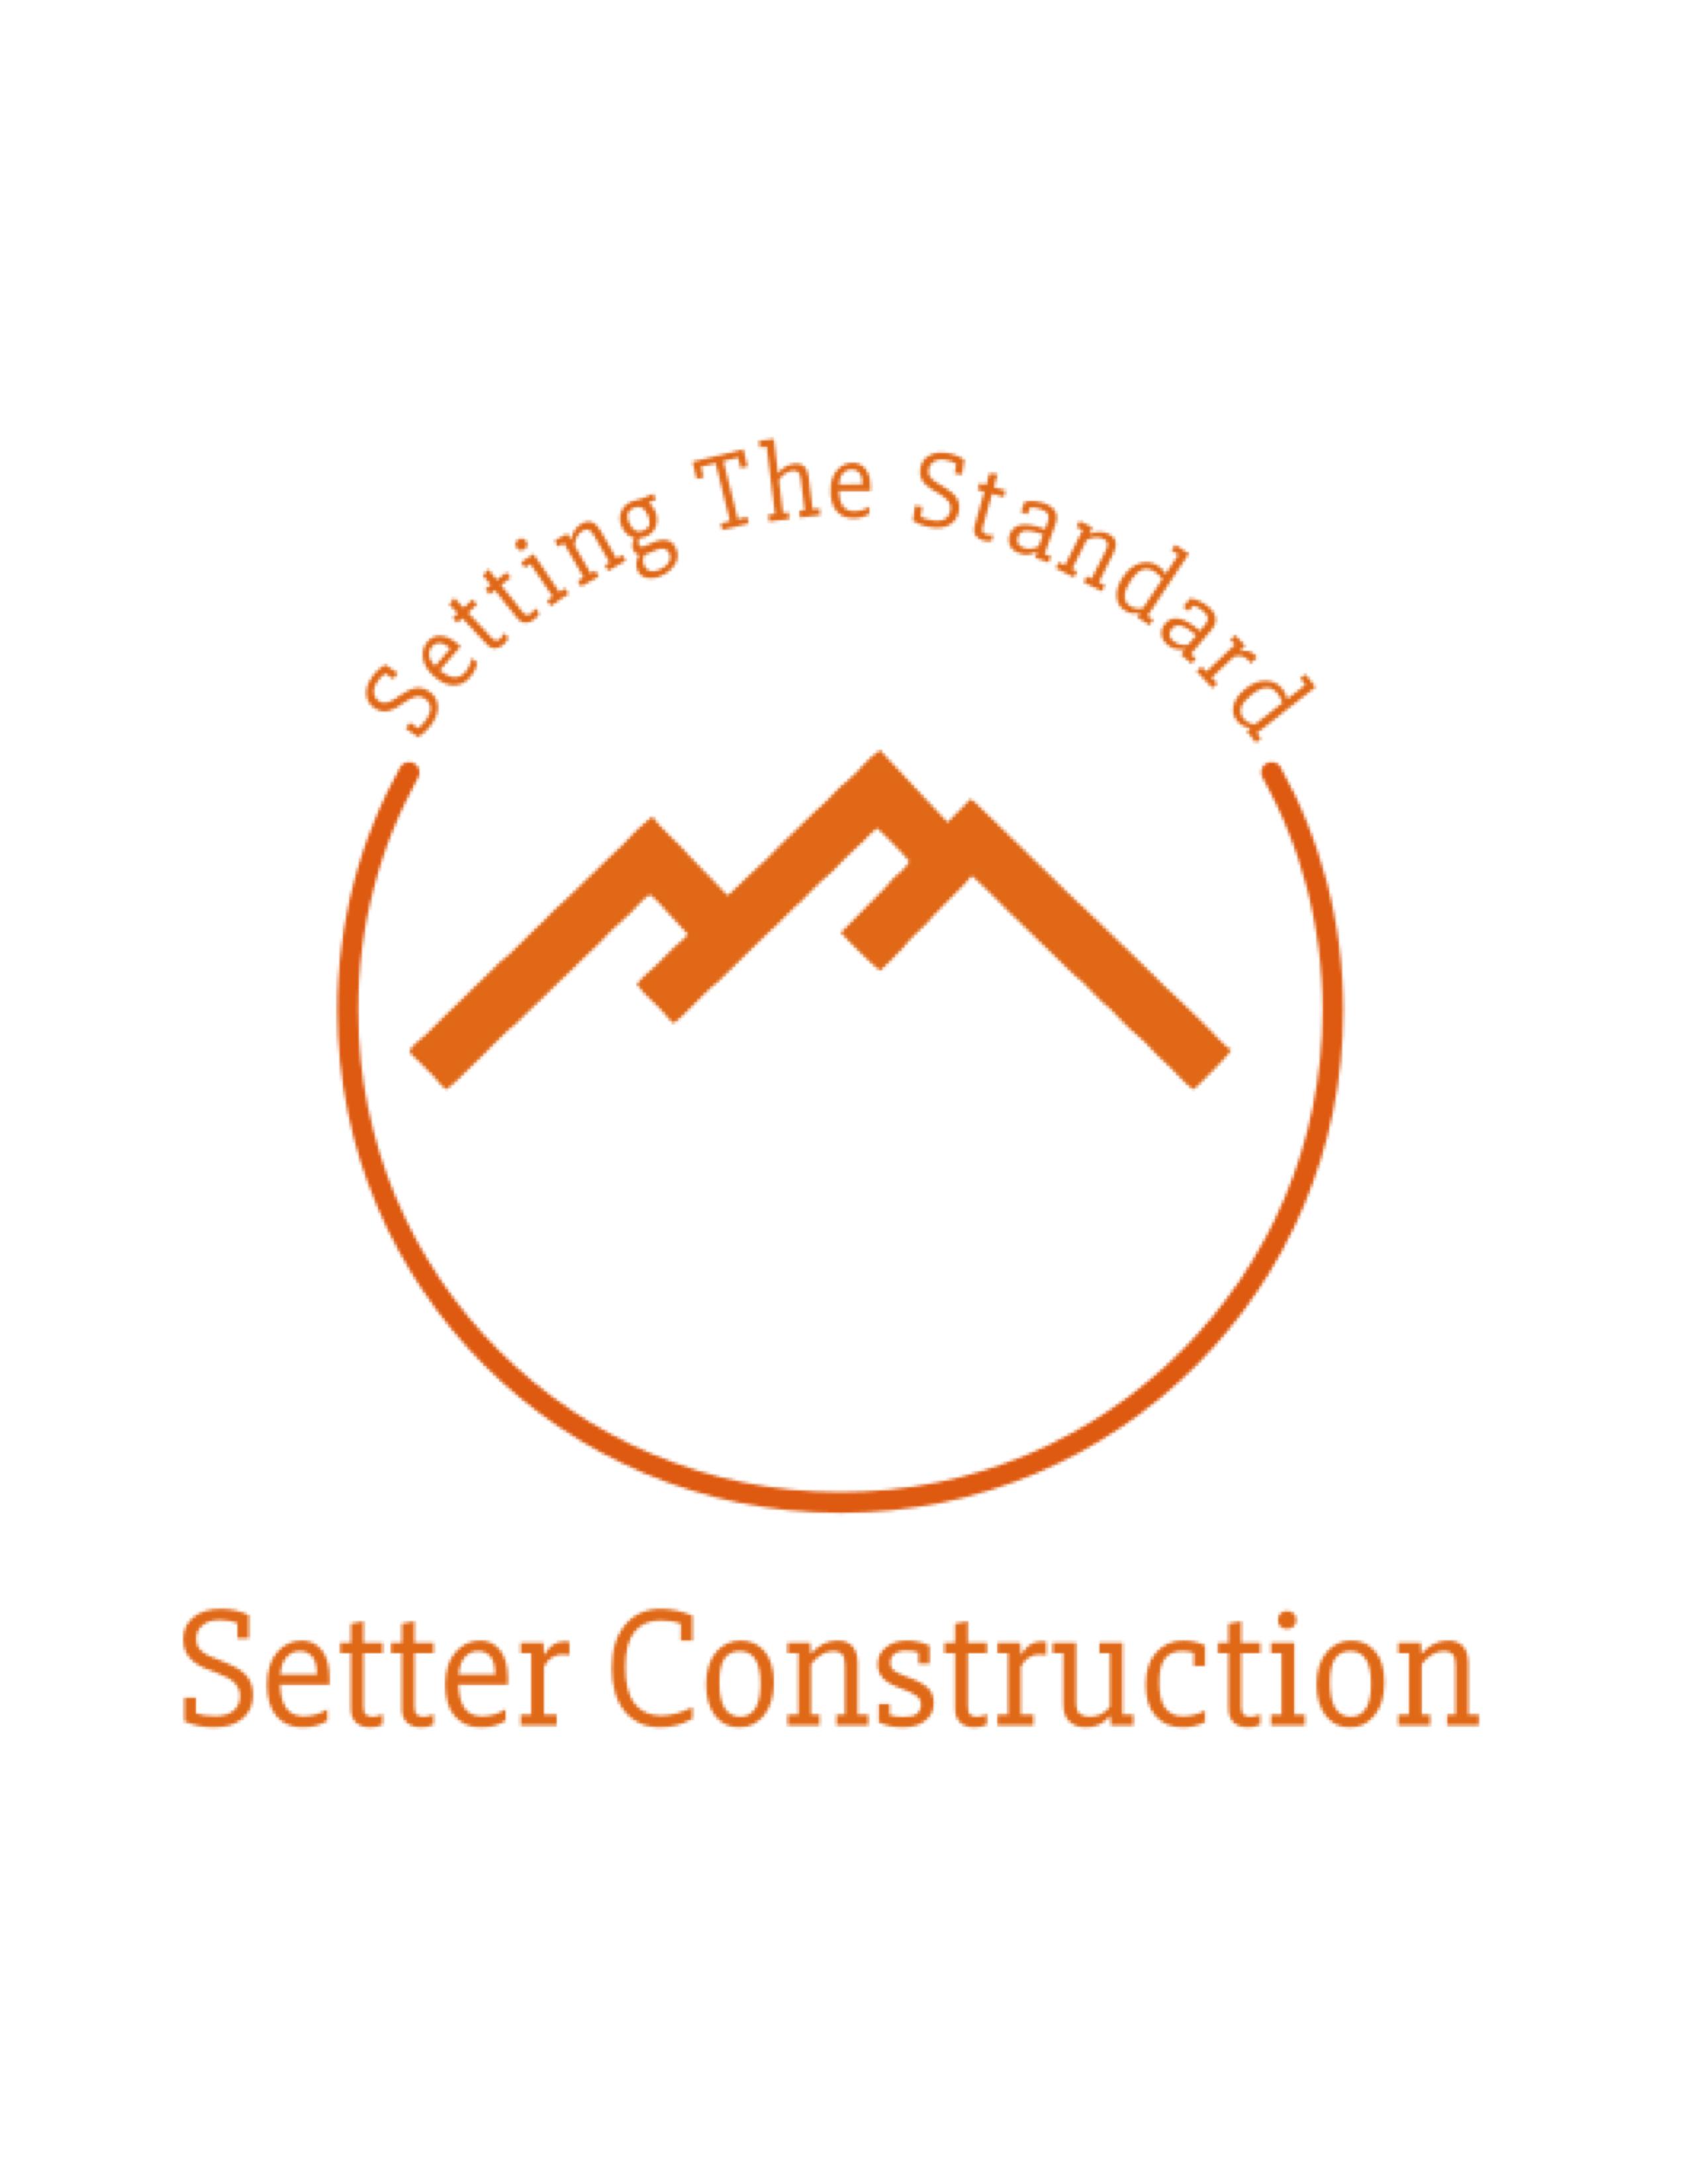 Setter Construction